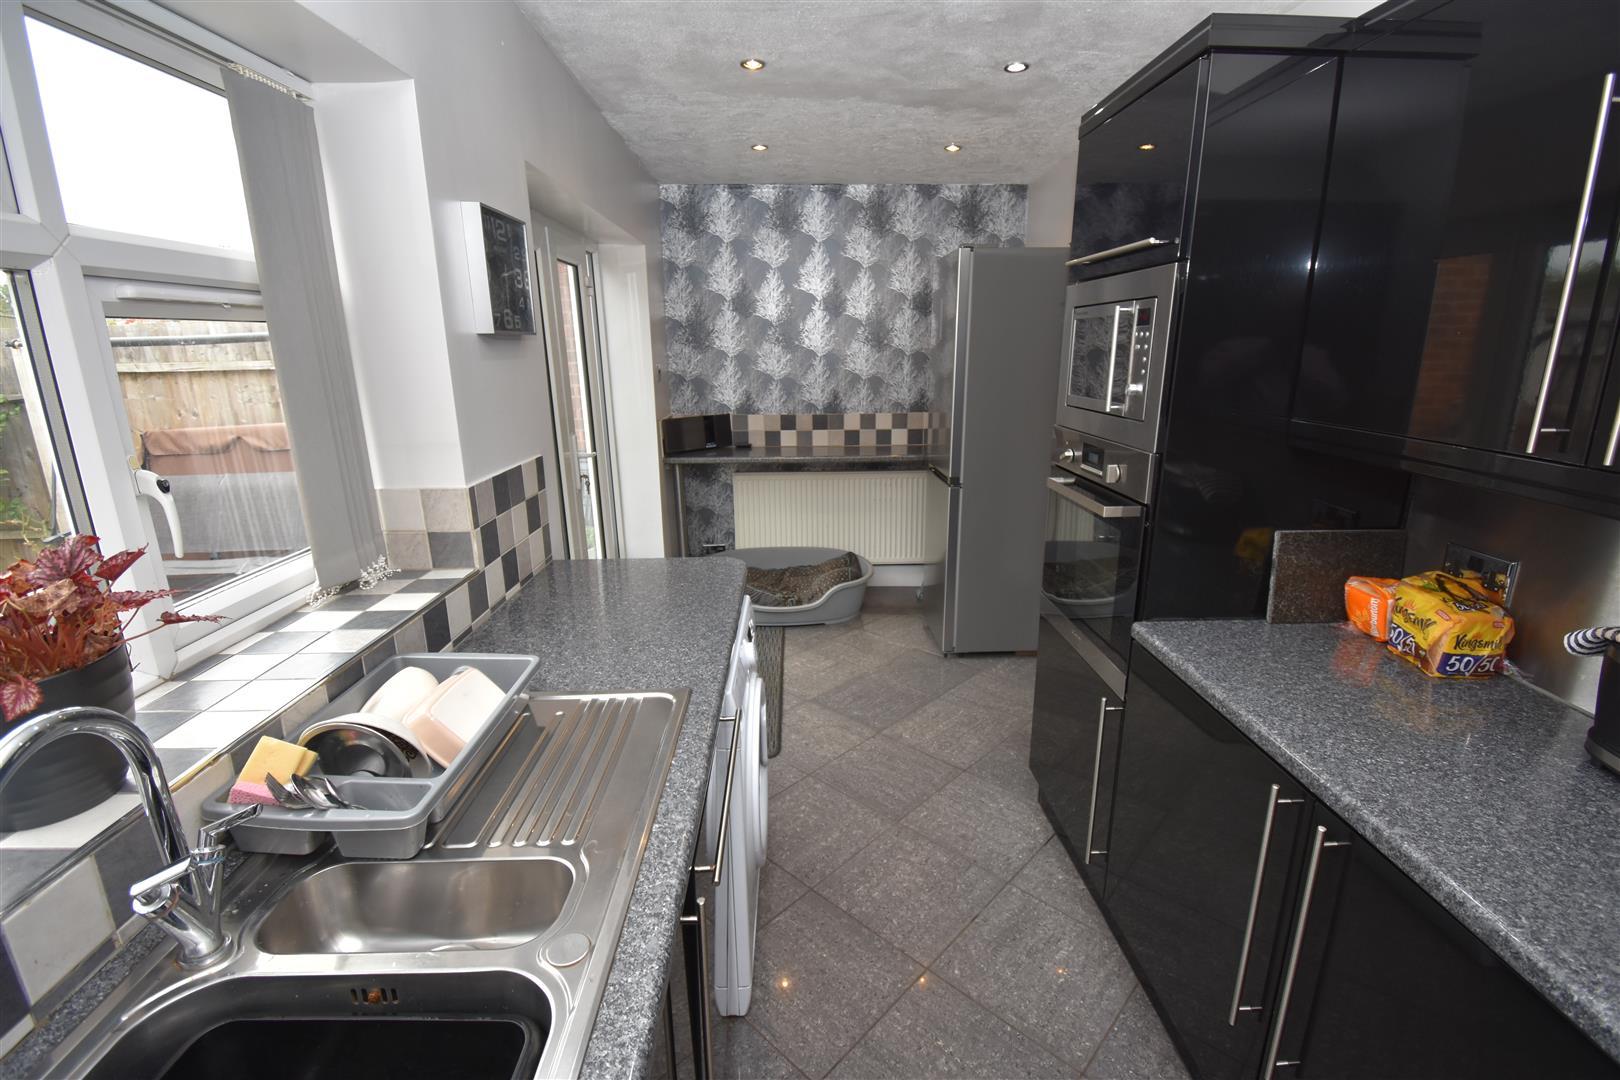 3 bed house for sale in Drews Lane, Birmingham B8 2SL 7